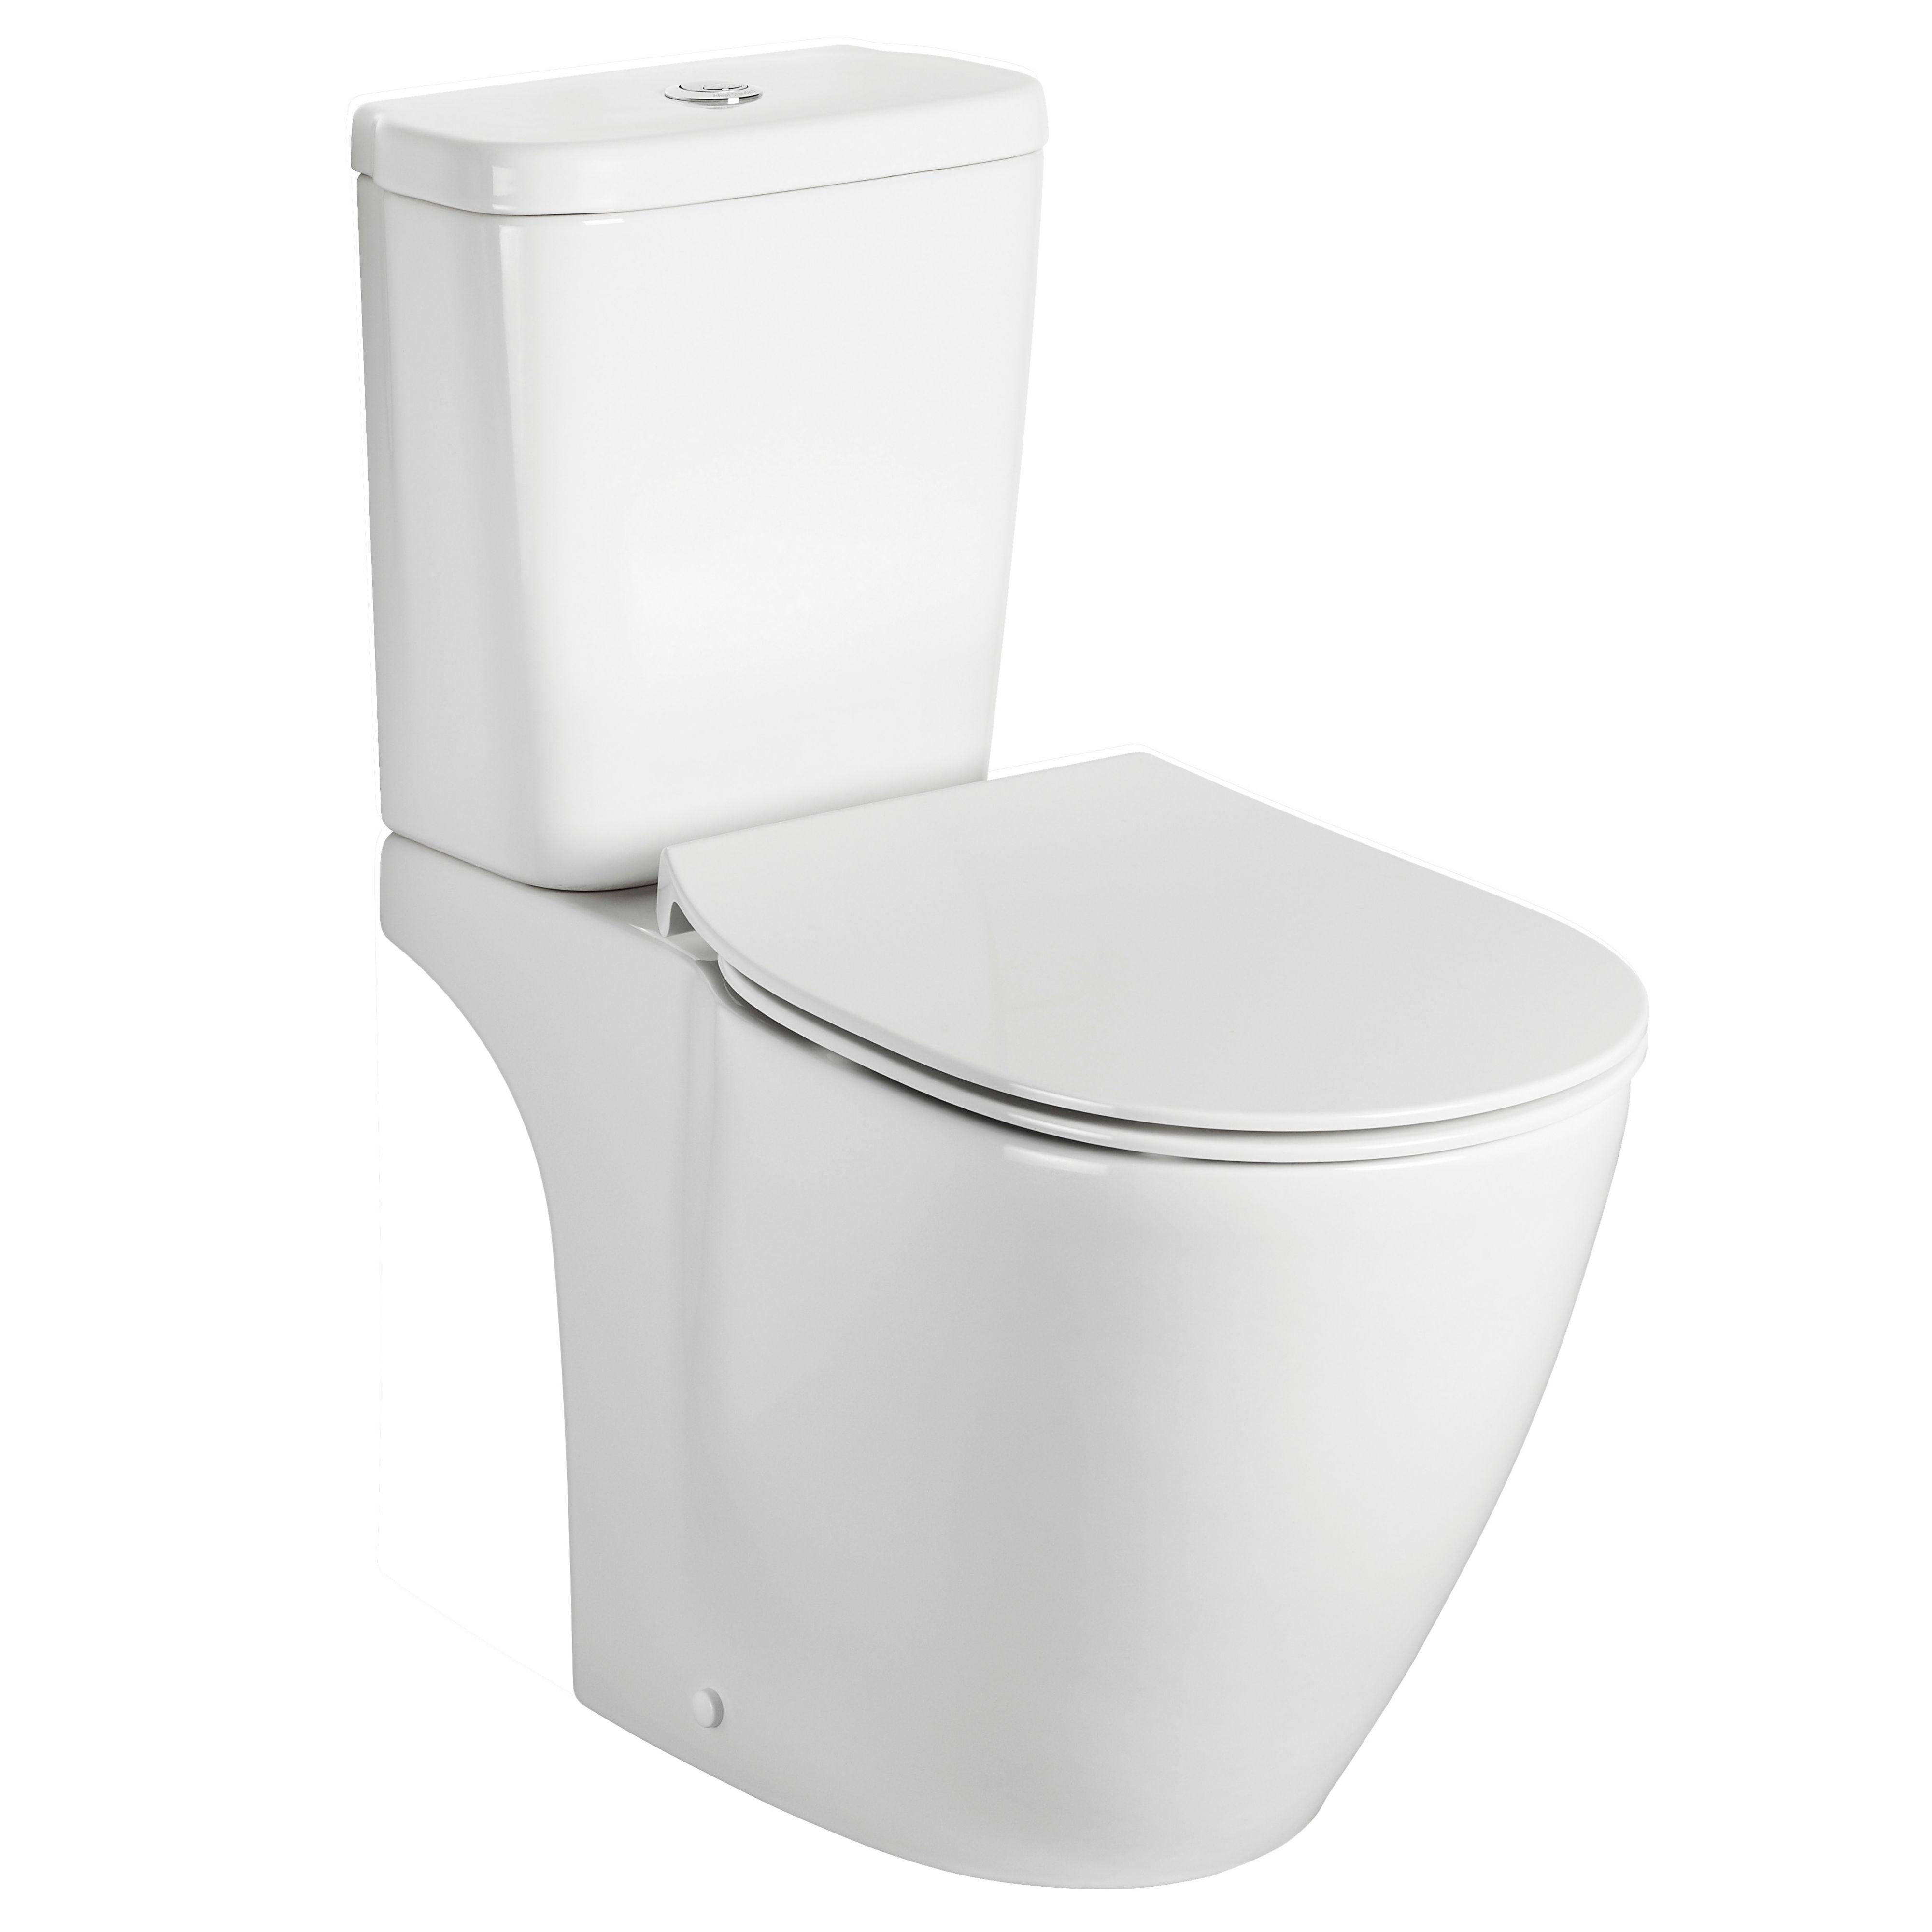 ideal standard imagine aquablade contemporary close coupled toilet with soft close seat. Black Bedroom Furniture Sets. Home Design Ideas